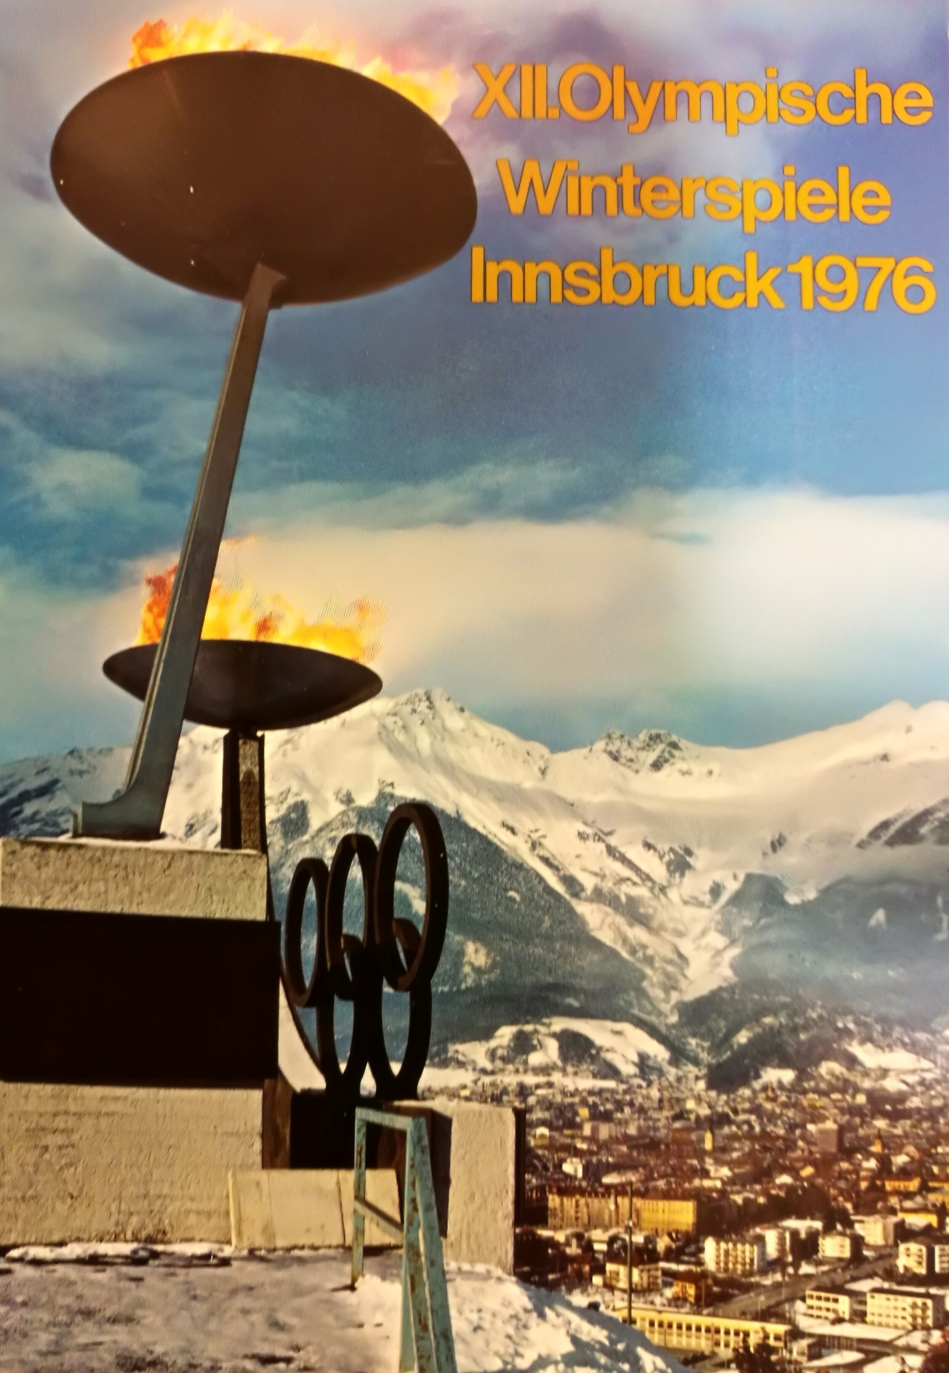 Olympische Winterspiele 1976-innsbruck-Postkarte.jpg